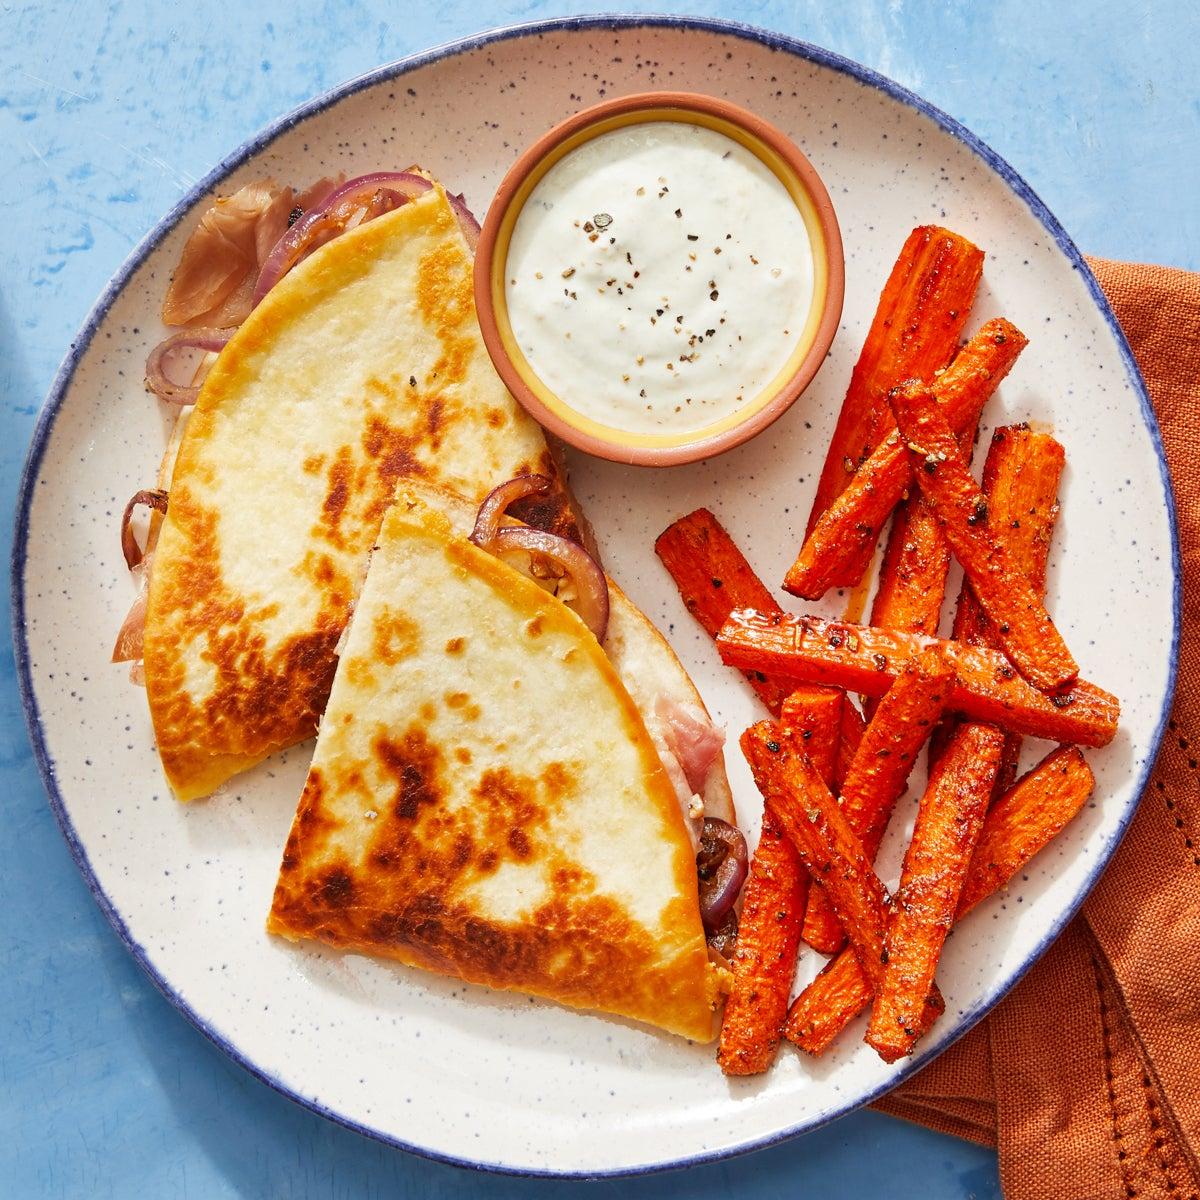 Prosciutto Quesadillas with Creamy Tomatillo Sauce & Roasted Carrots